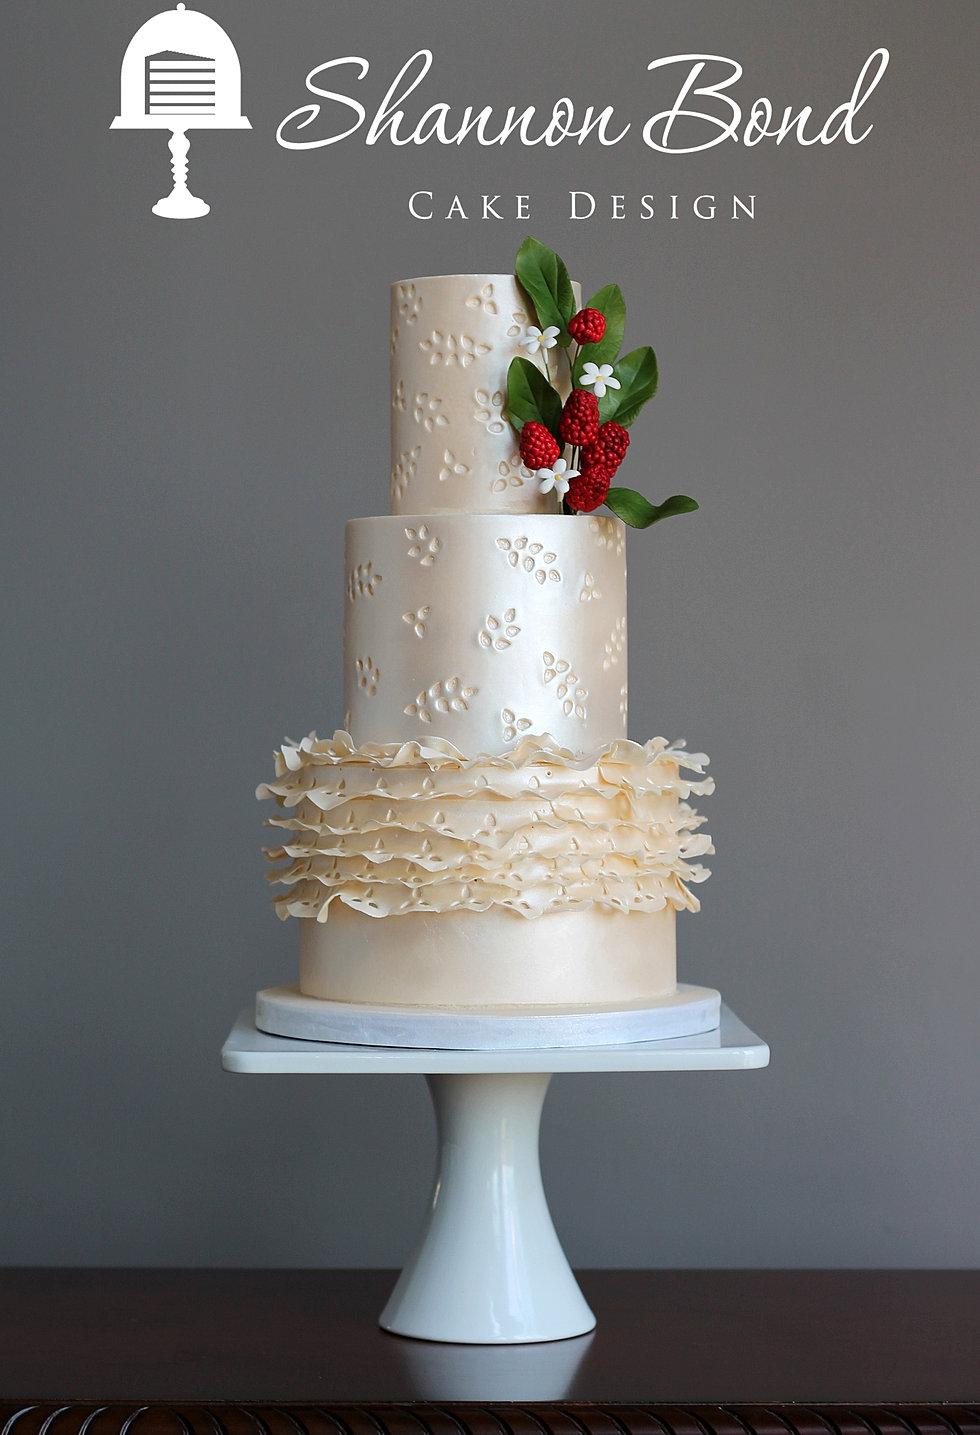 shannon bond cake design kansas city wedding and custom cakes wedding cakes. Black Bedroom Furniture Sets. Home Design Ideas